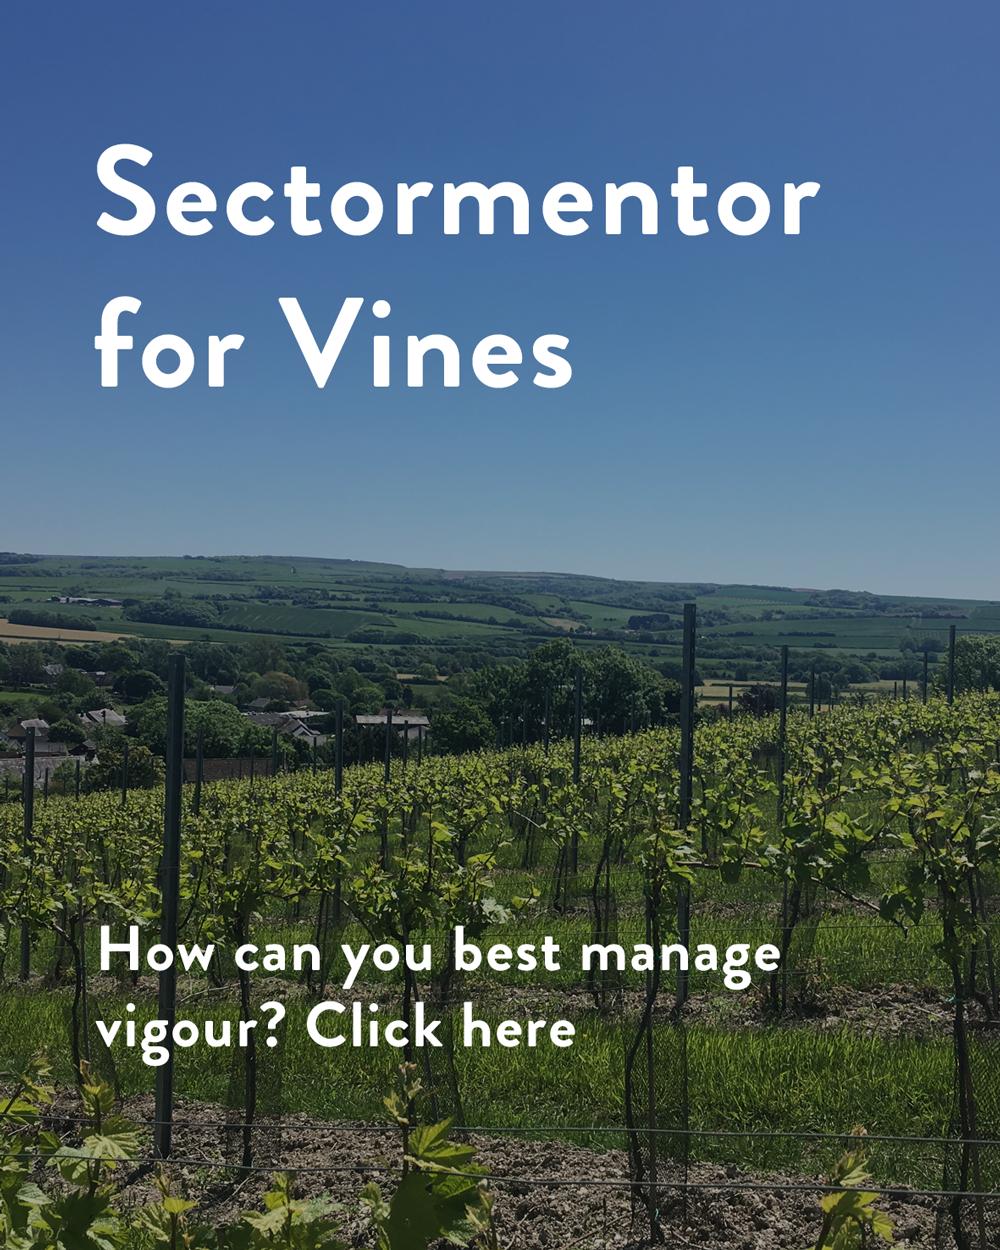 vines.sectormentor.com